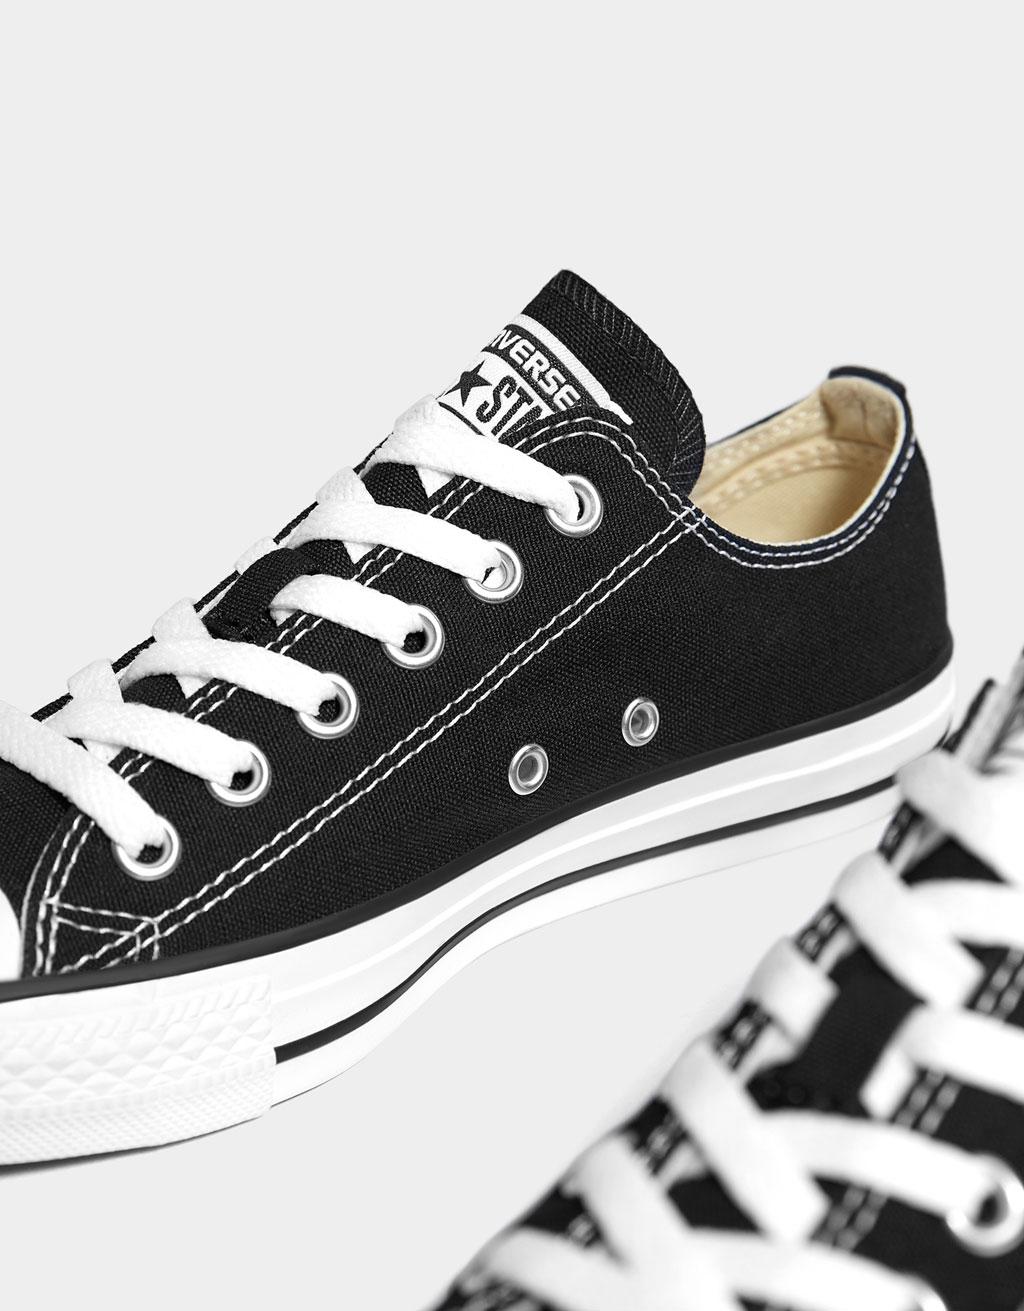 cc3ac6f62f5 CONVERSE CHUCK TAYLOR ALL STAR canvas sneakers - SHOES - Bershka ...